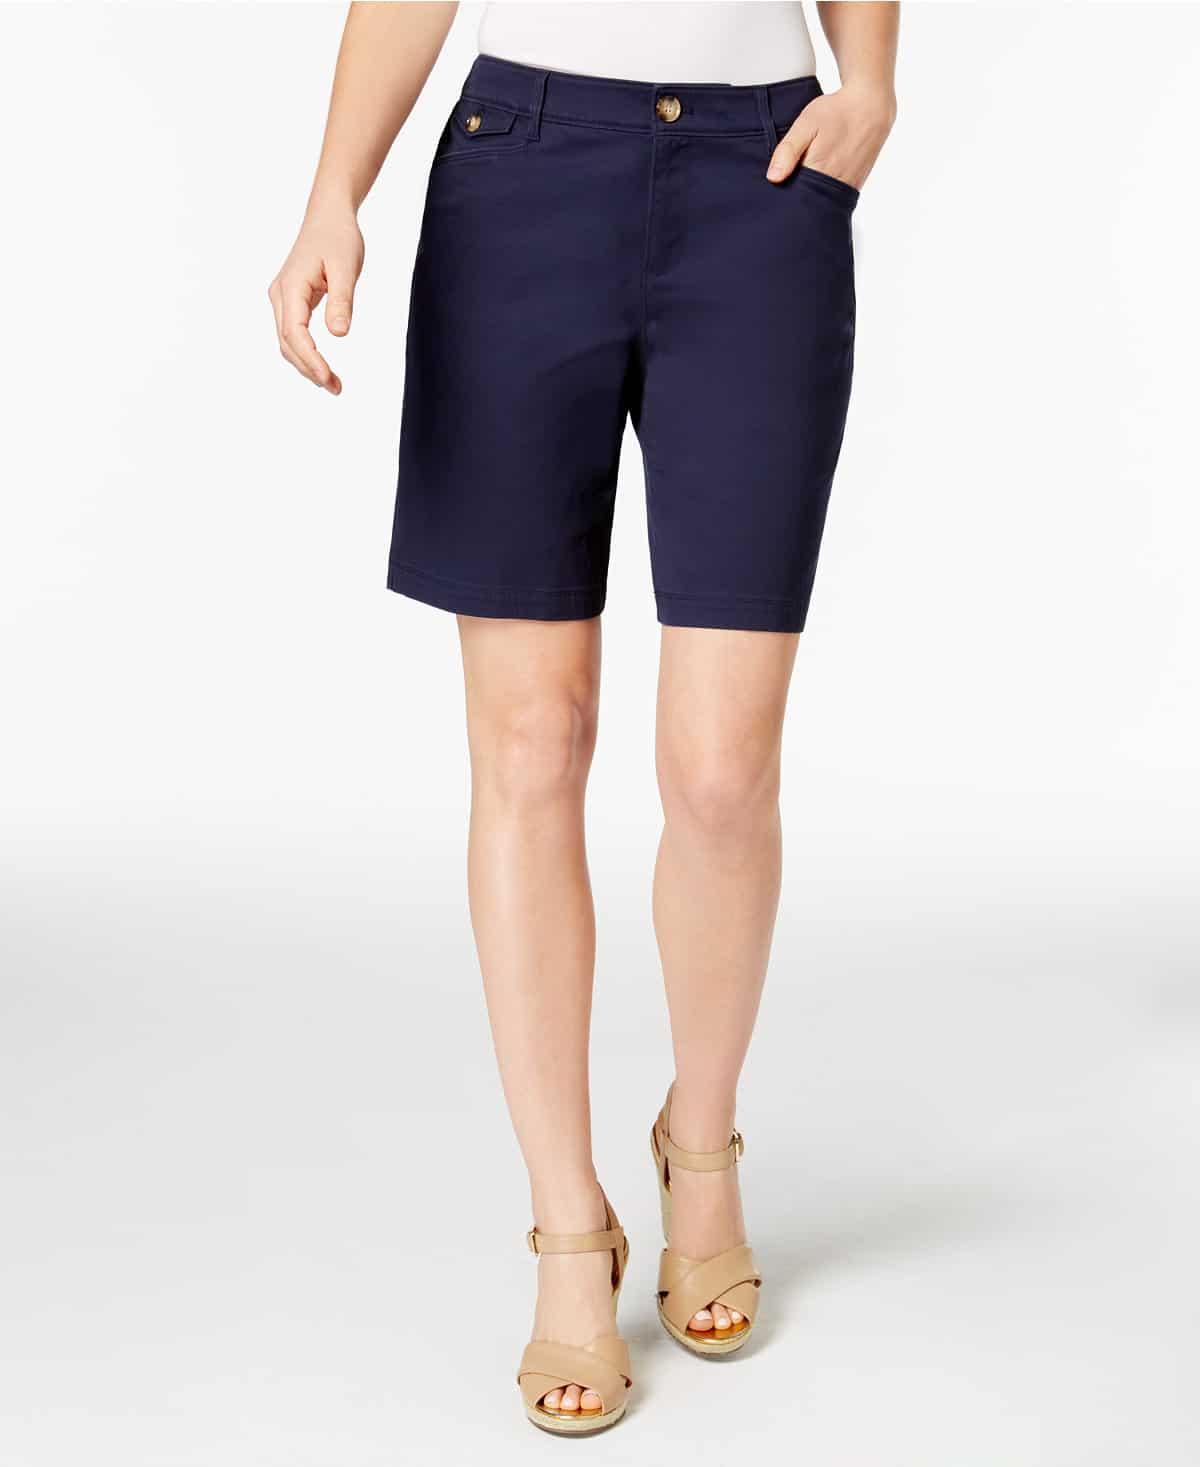 Mid-length shorts in navy from Macy's